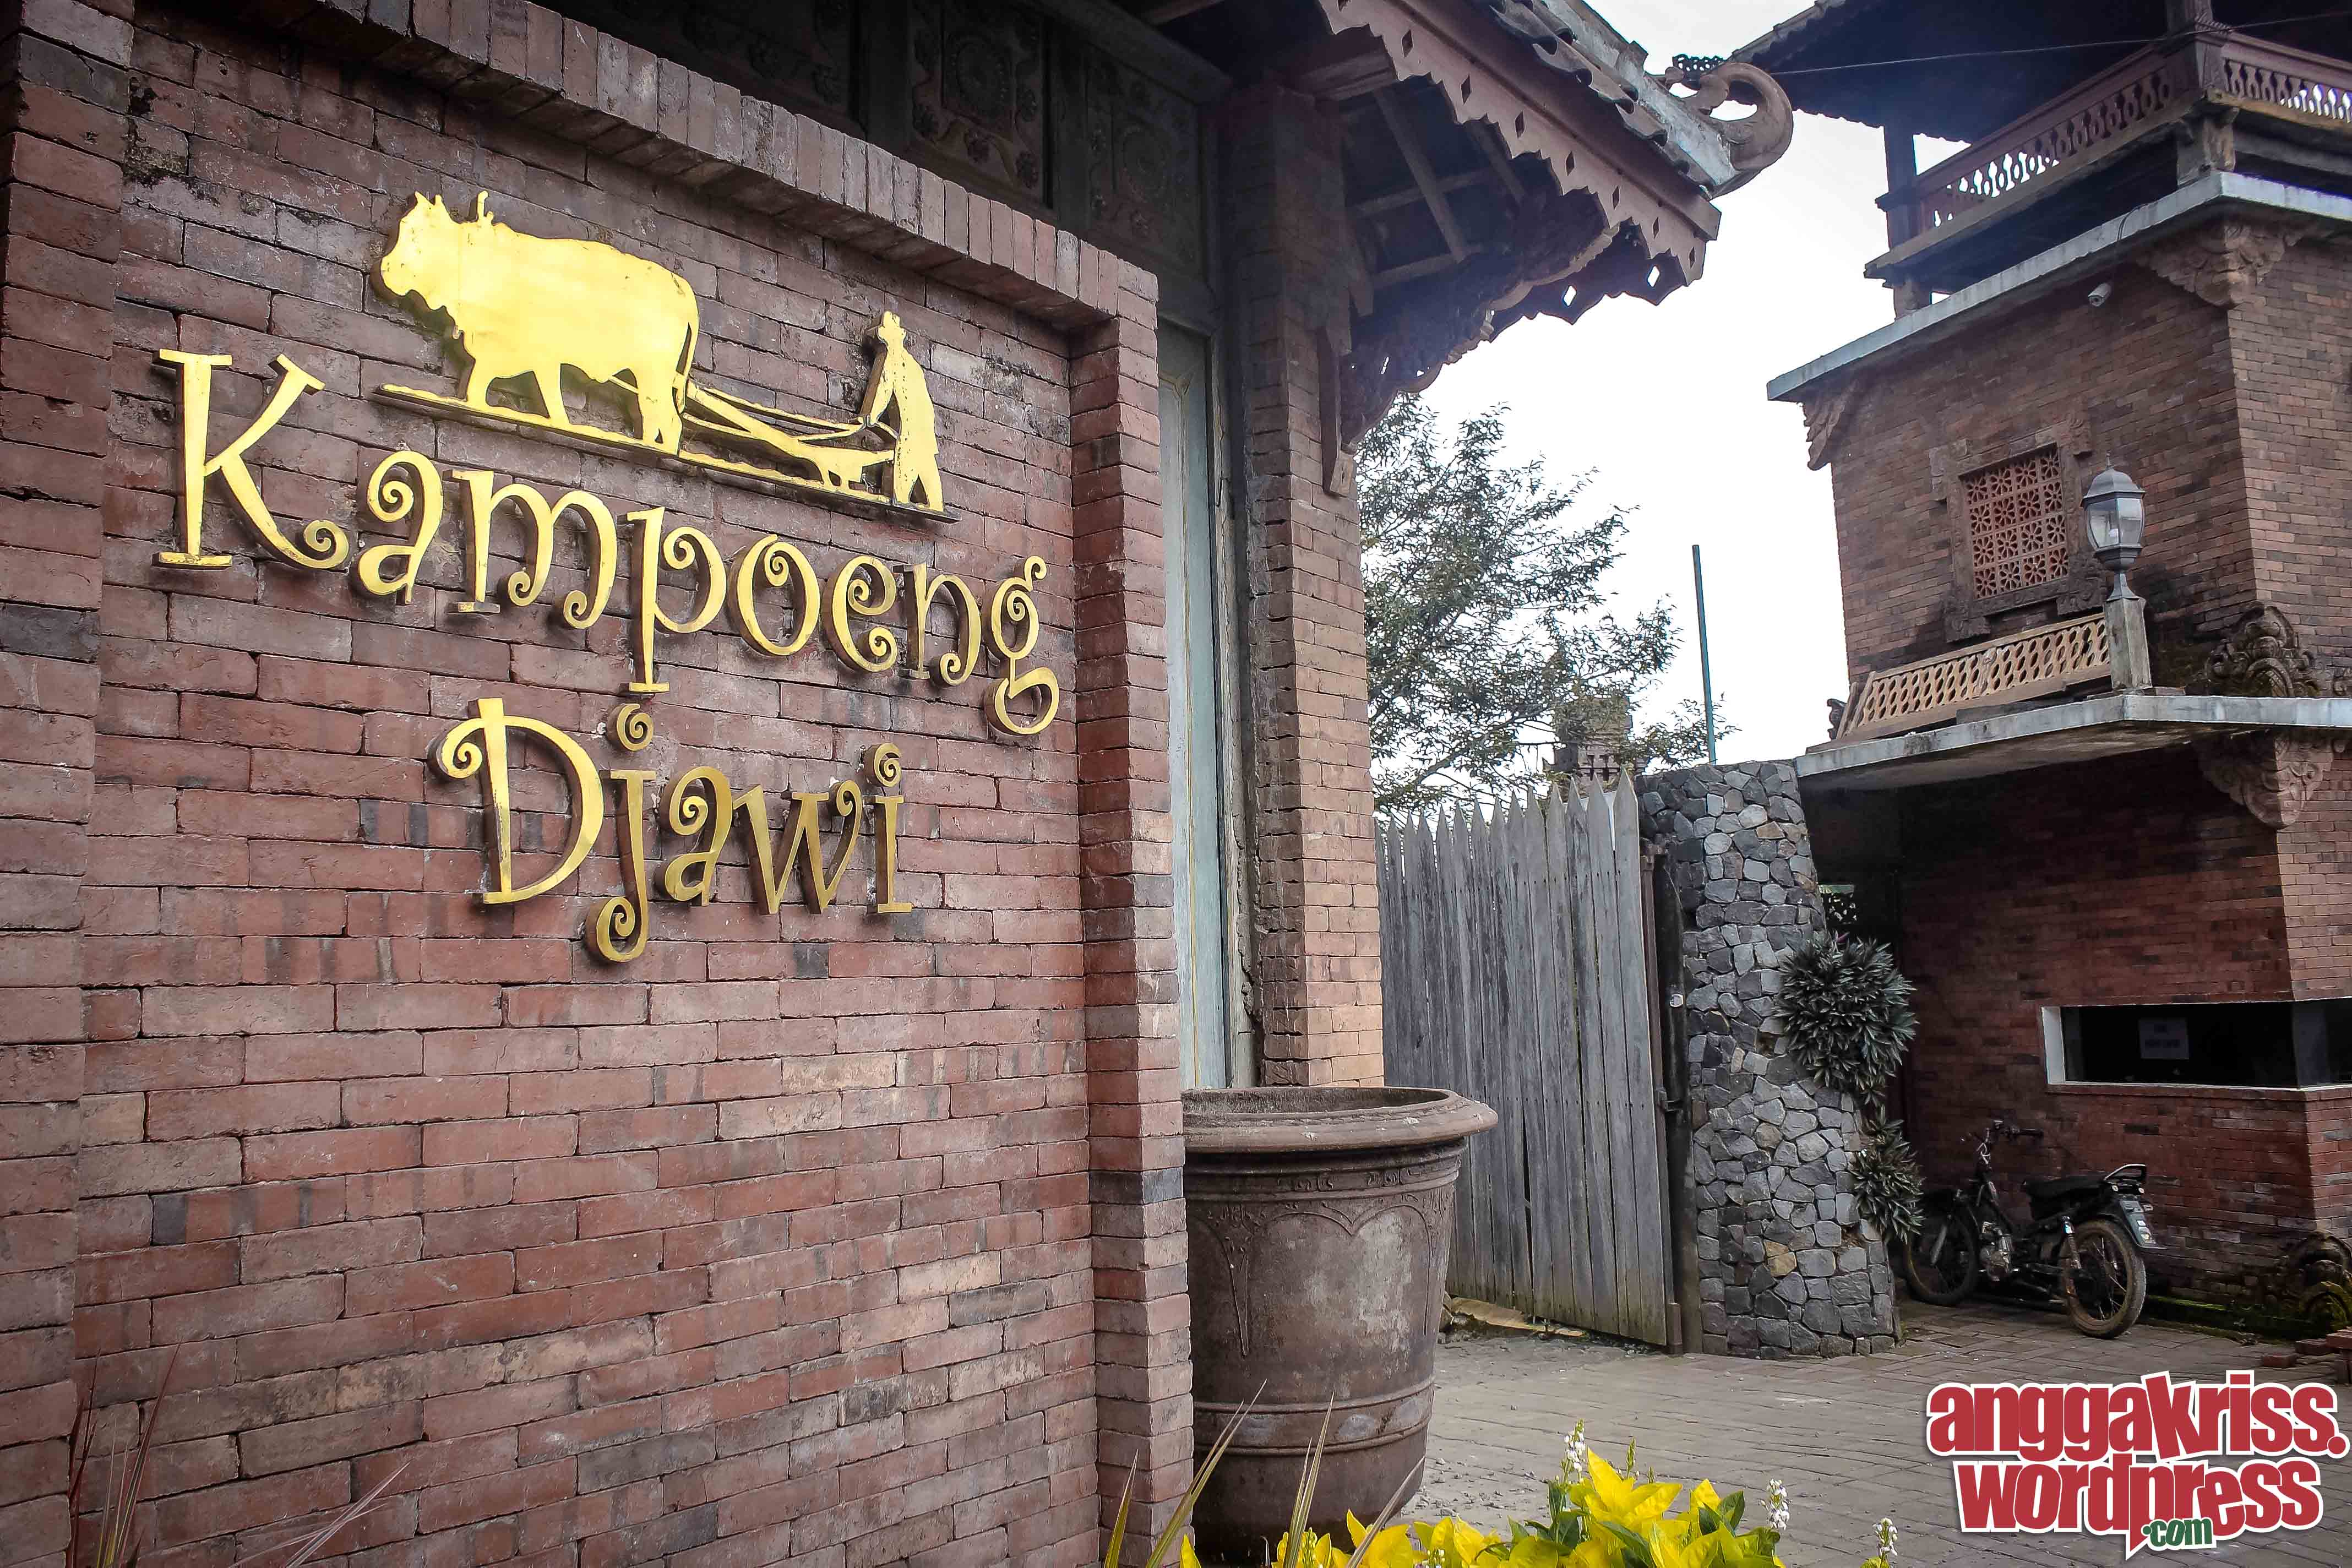 Menengok Kampoeng Djawi Wonosalam Anggakris Blog Kalian Tau Dimana Lokasinya